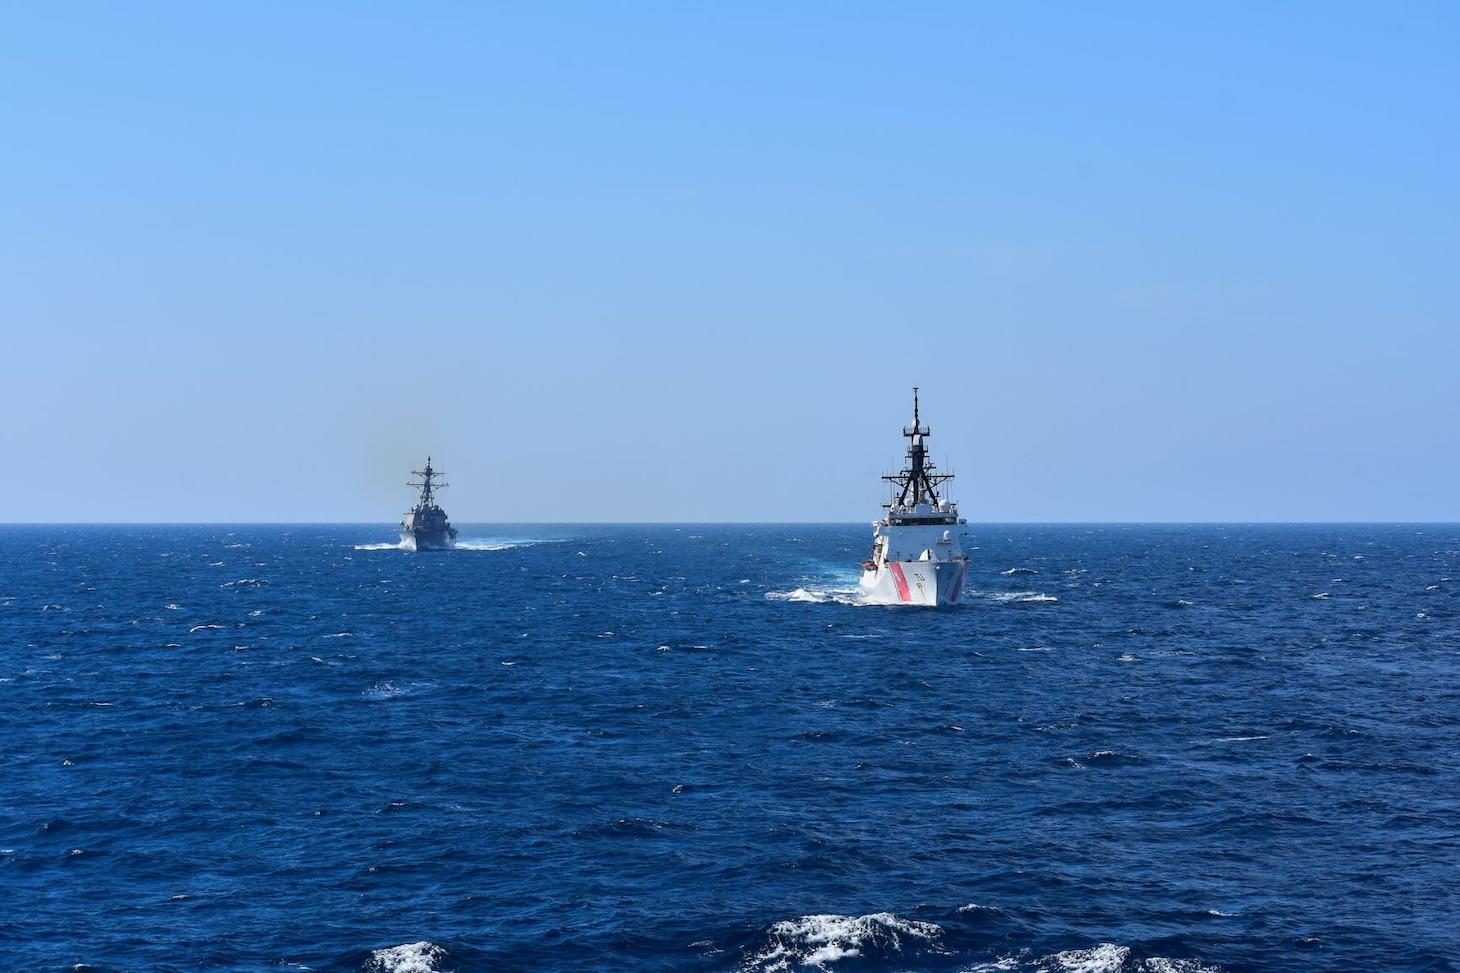 VBSS with U.S. Navy